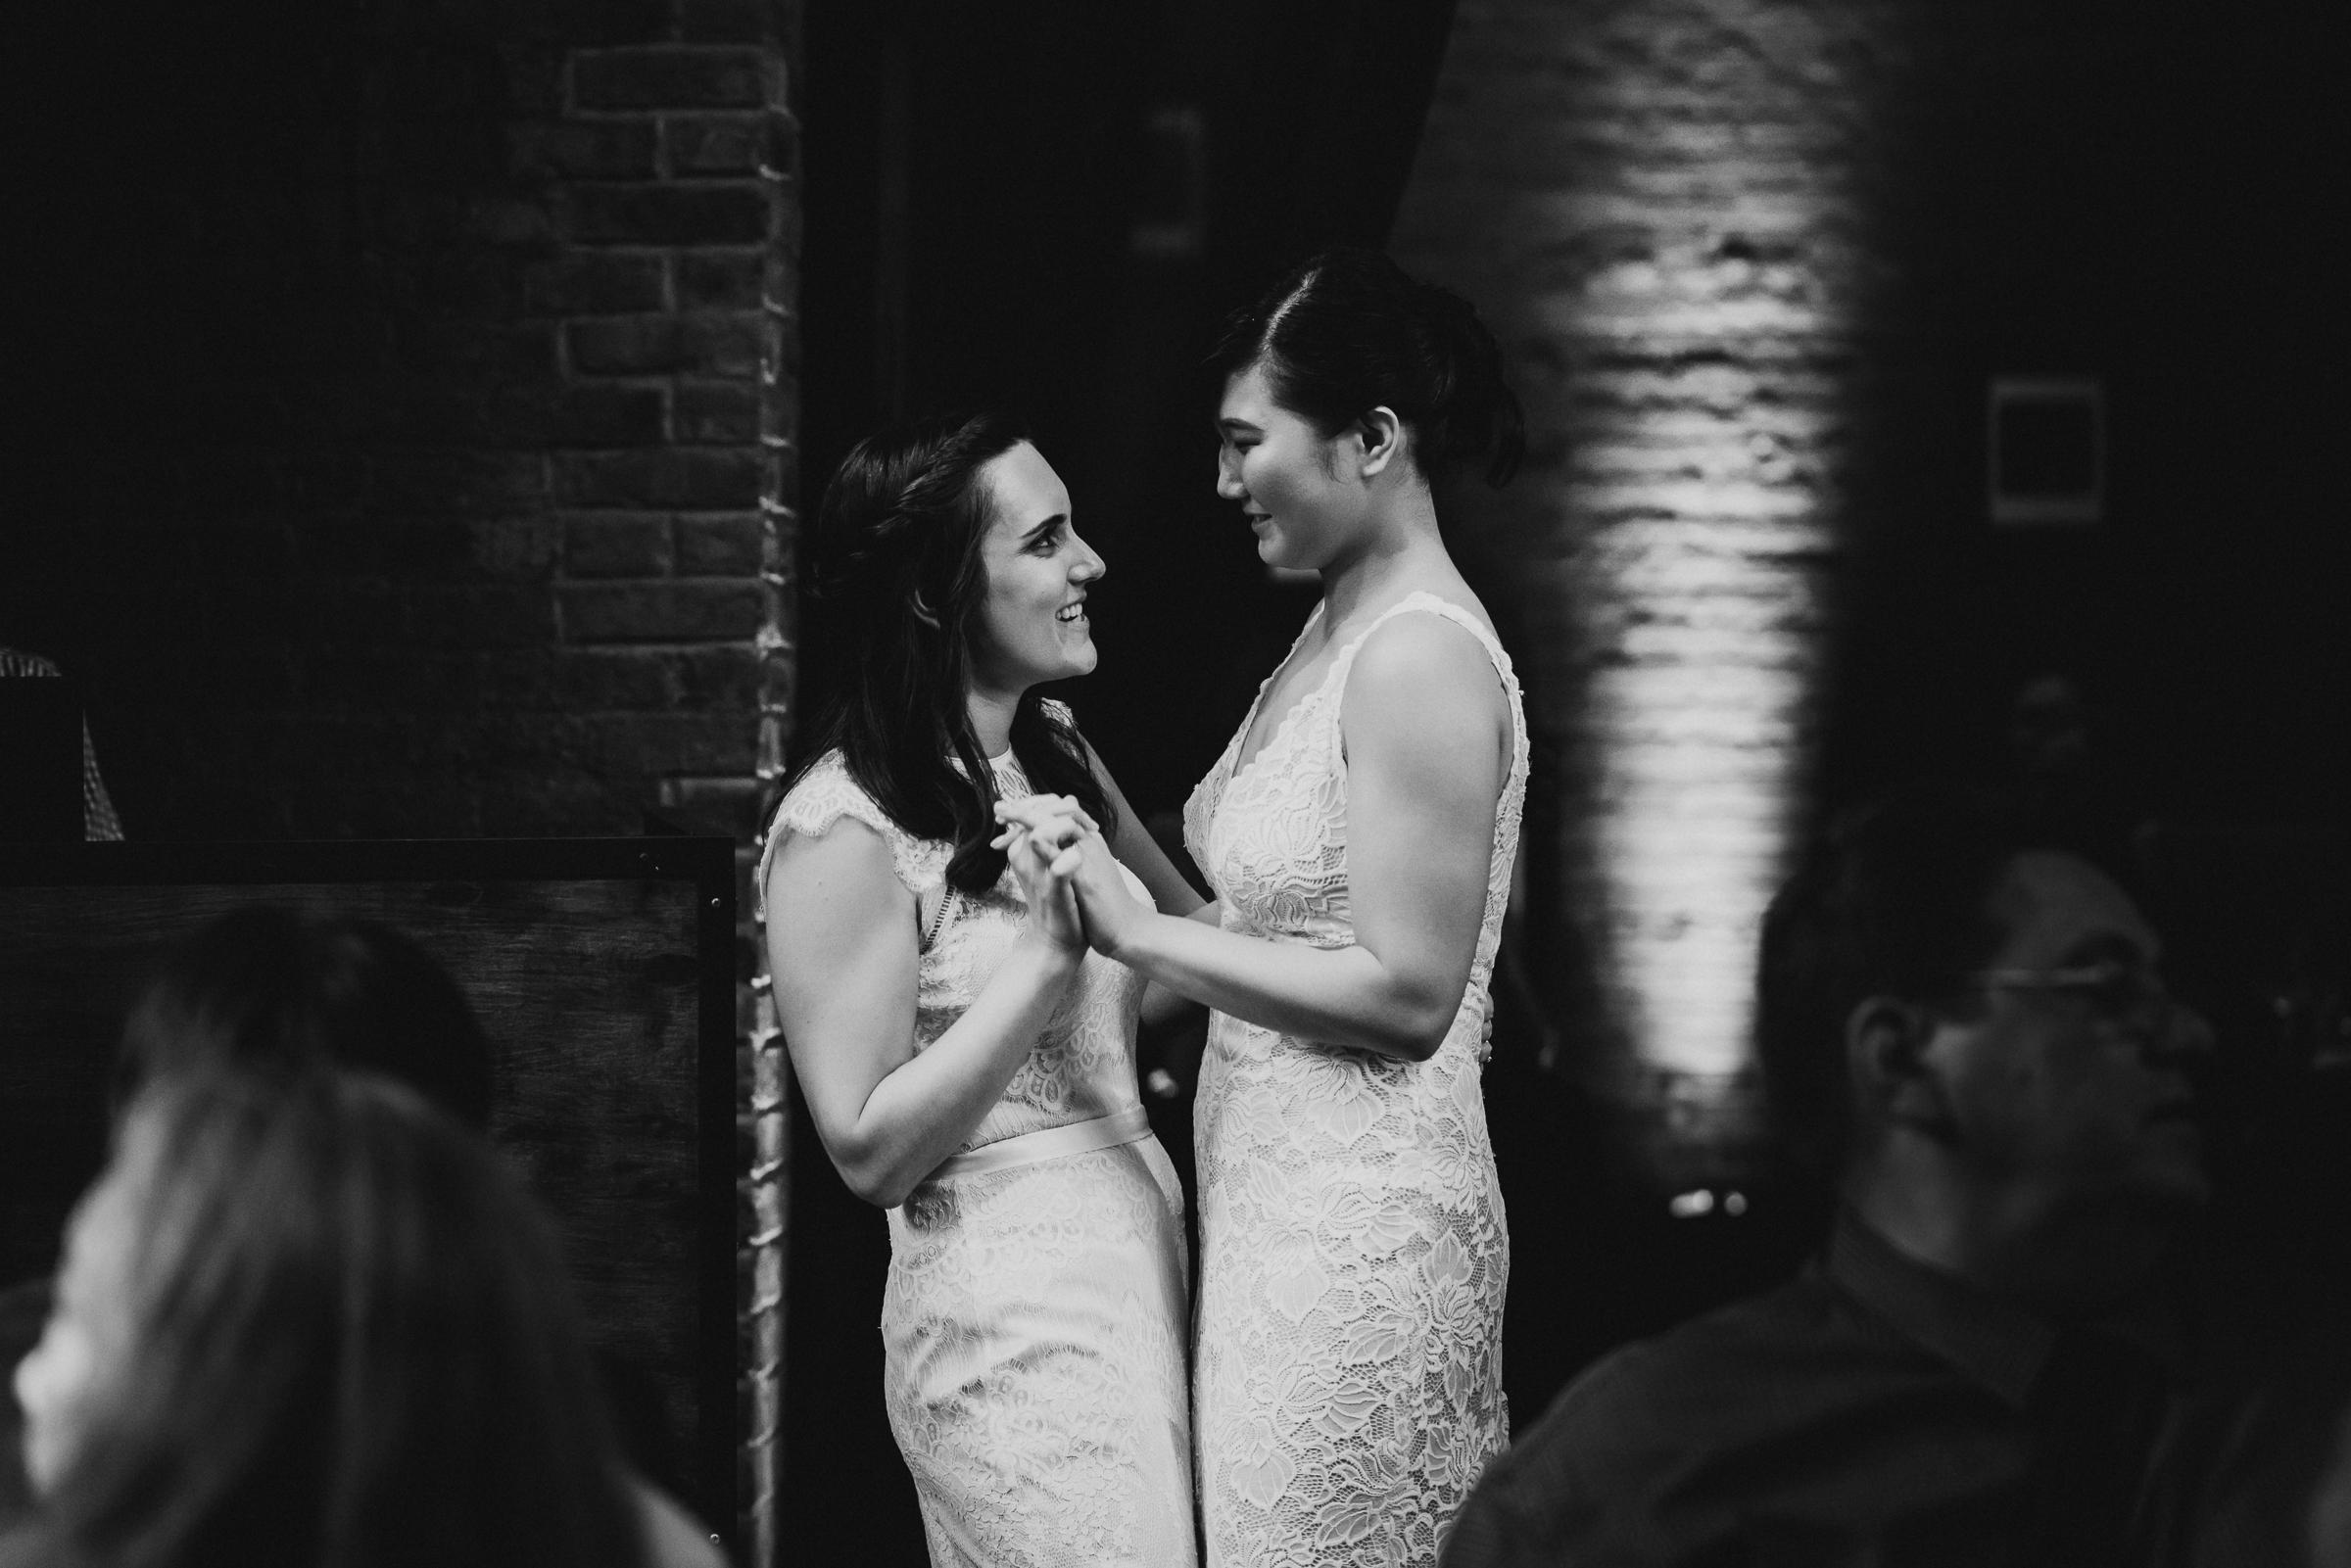 My-Moon-Brooklyn-LGBT-Gay-Documentary-Wedding-Photographer-86.jpg